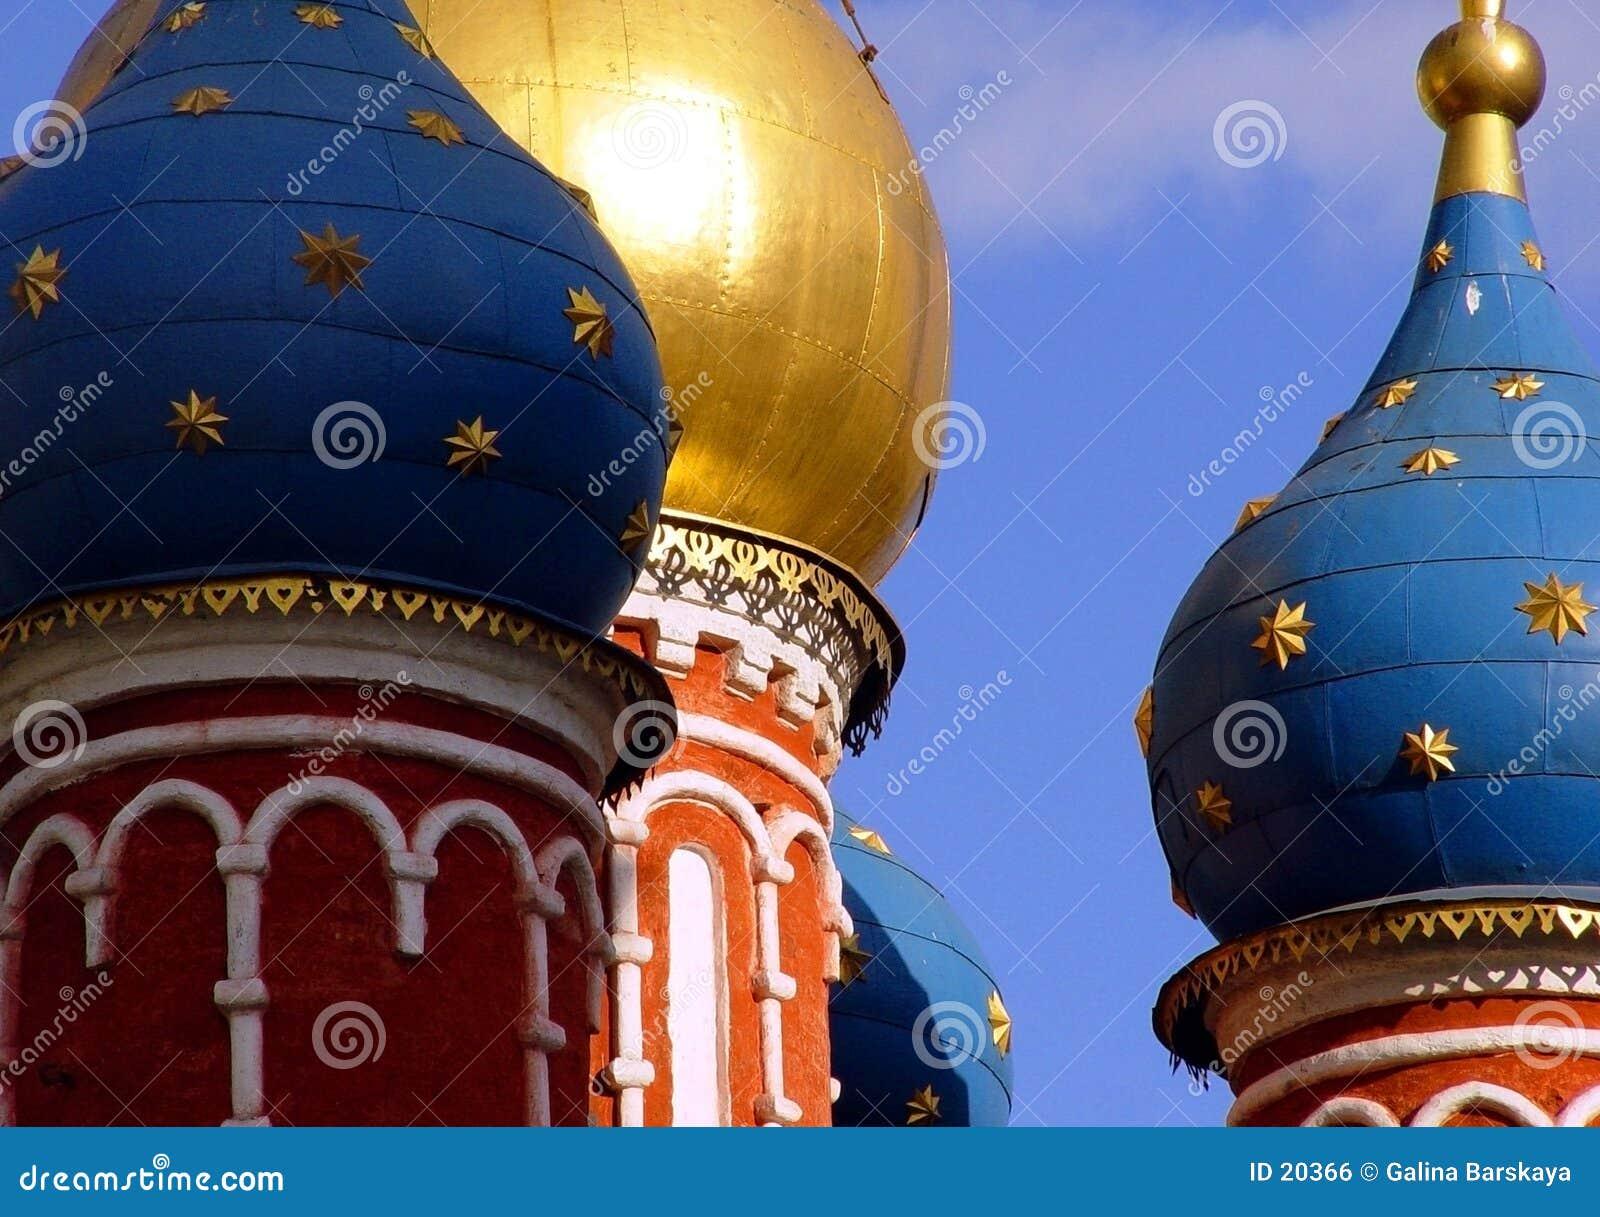 Bóvedas en Moscú céntrica